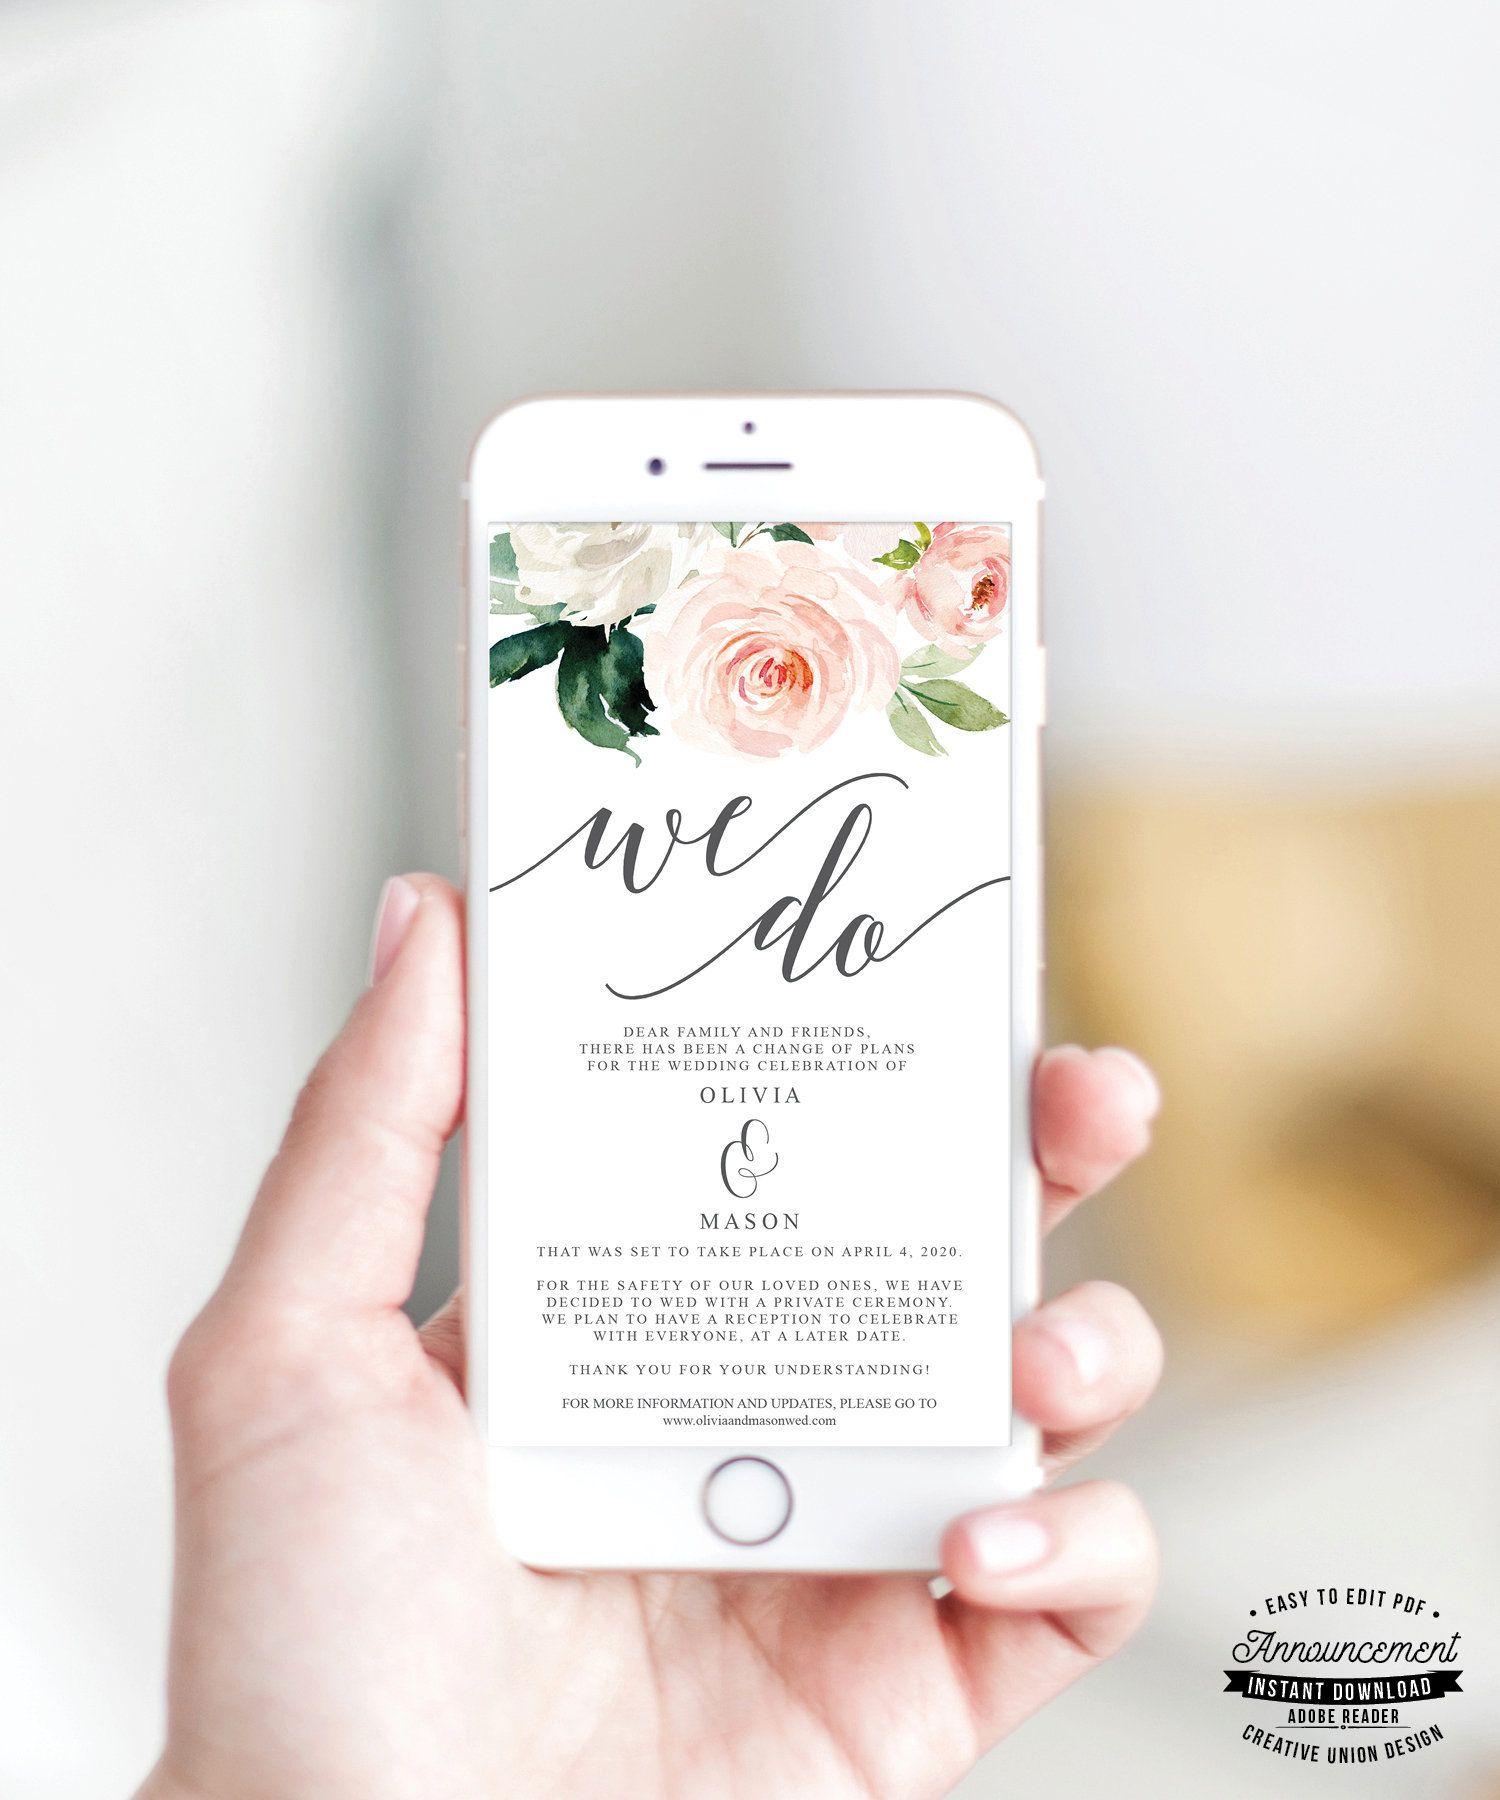 33+ Wedding cancellation cards shutterfly ideas in 2021